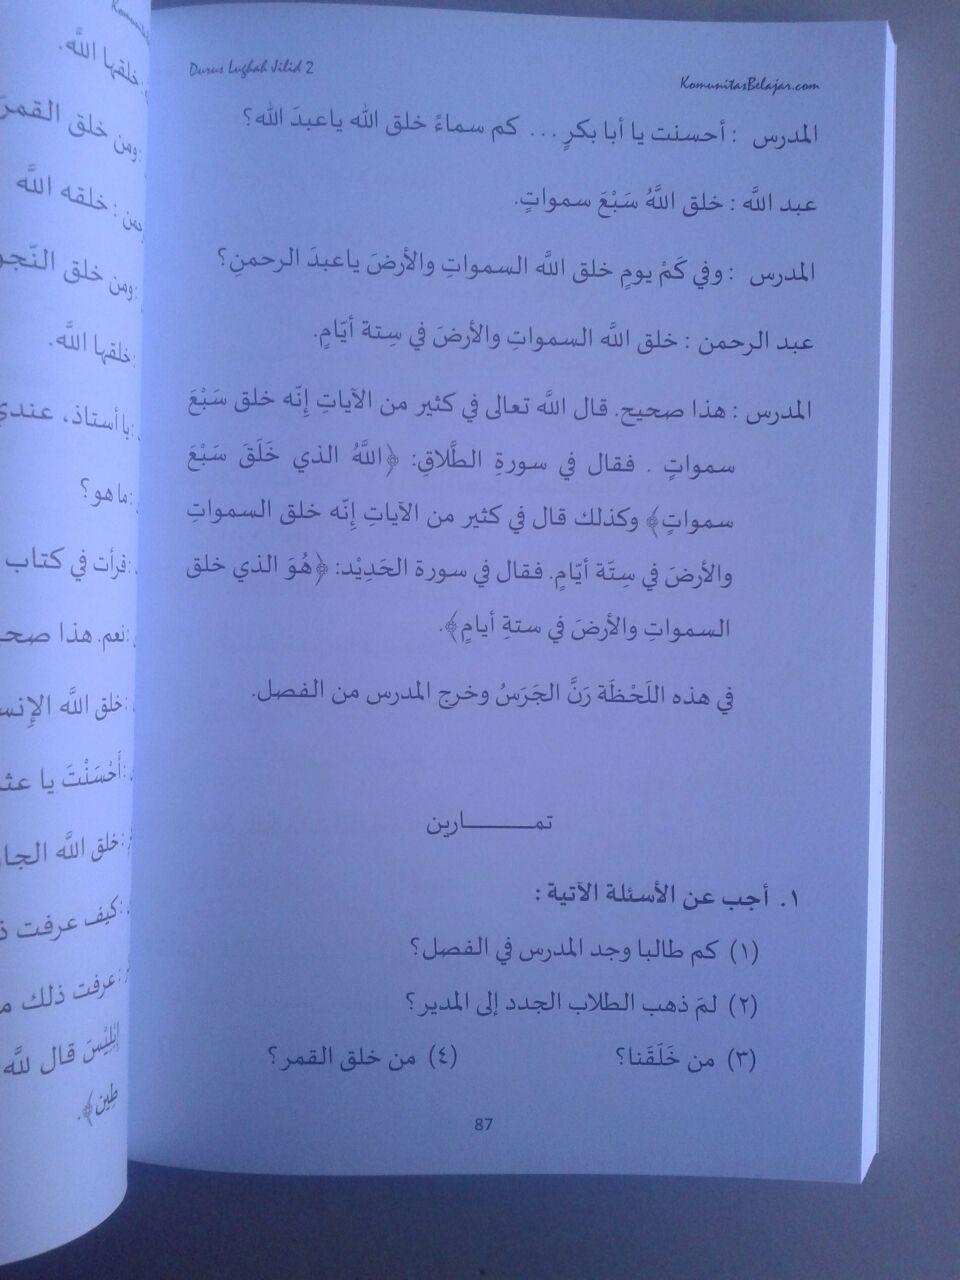 Buku Panduan Durus Lughah 2 Syarah Durusul Lughah isi